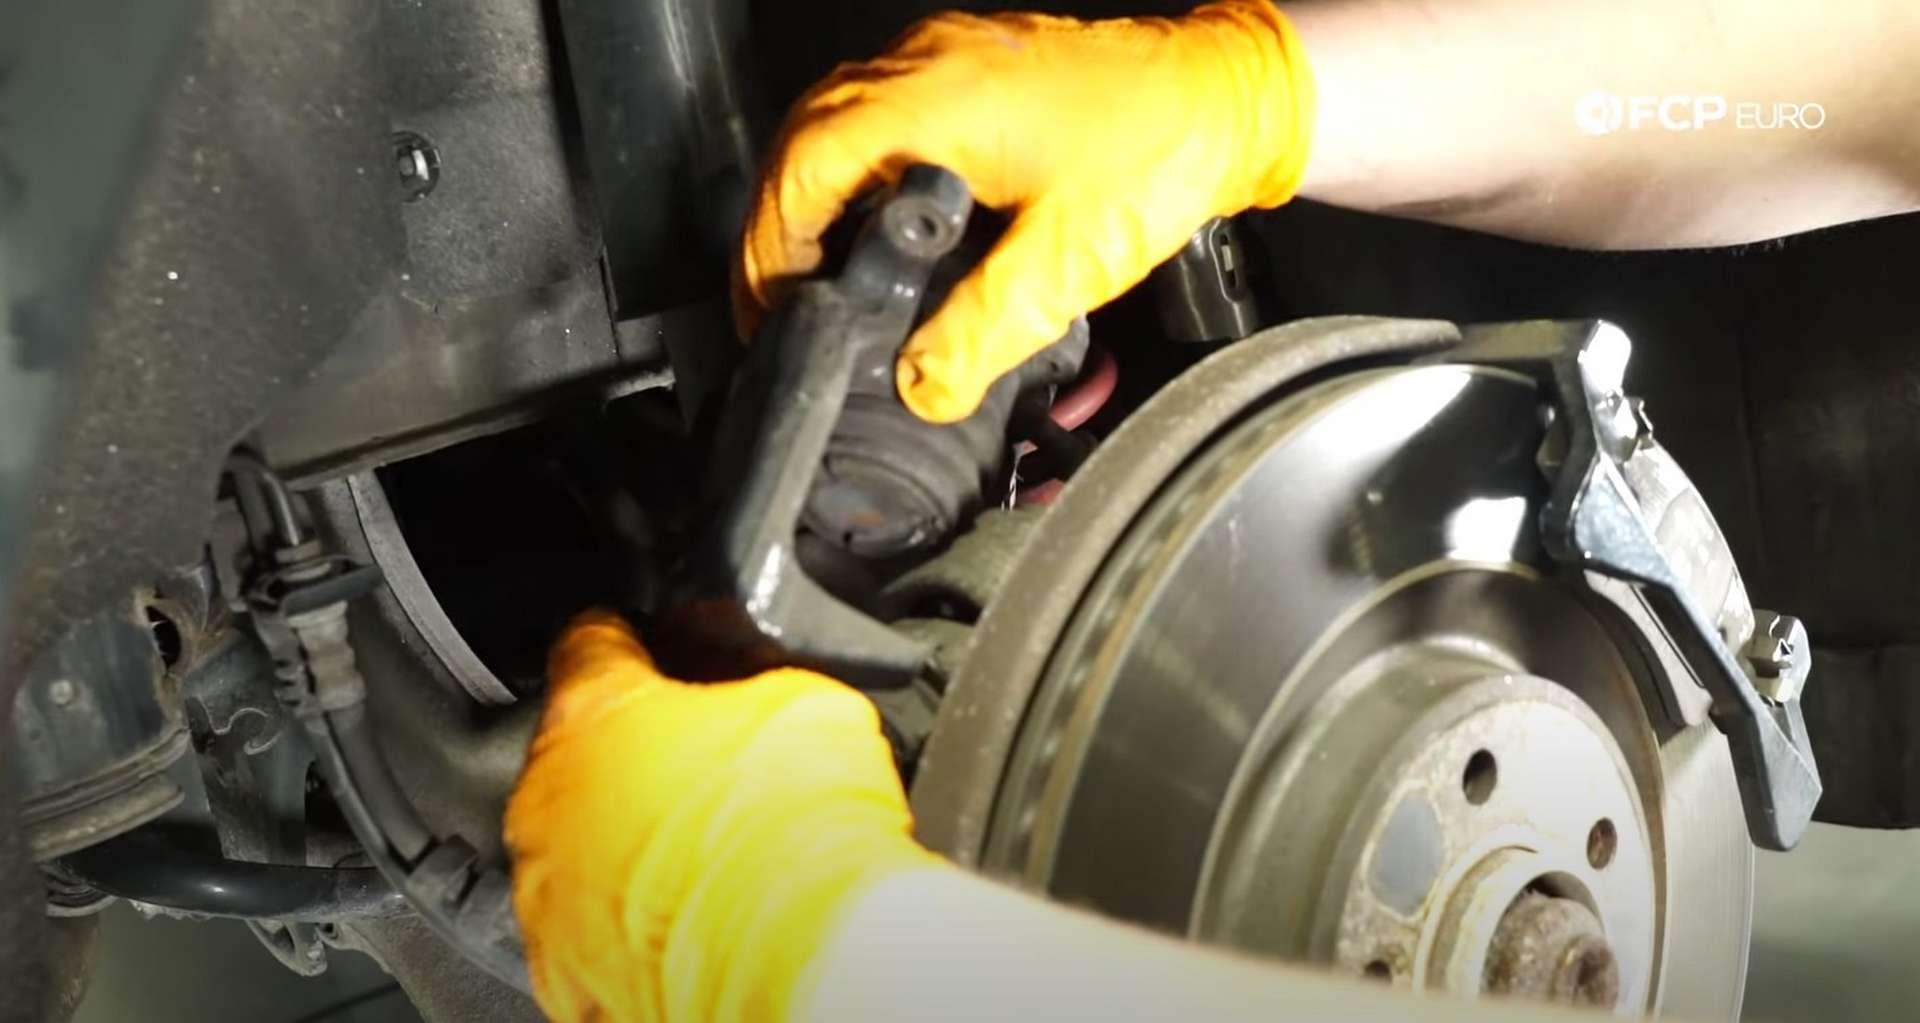 DIY Audi B8 S4 Rear Brake Service resting the caliper on the suspension